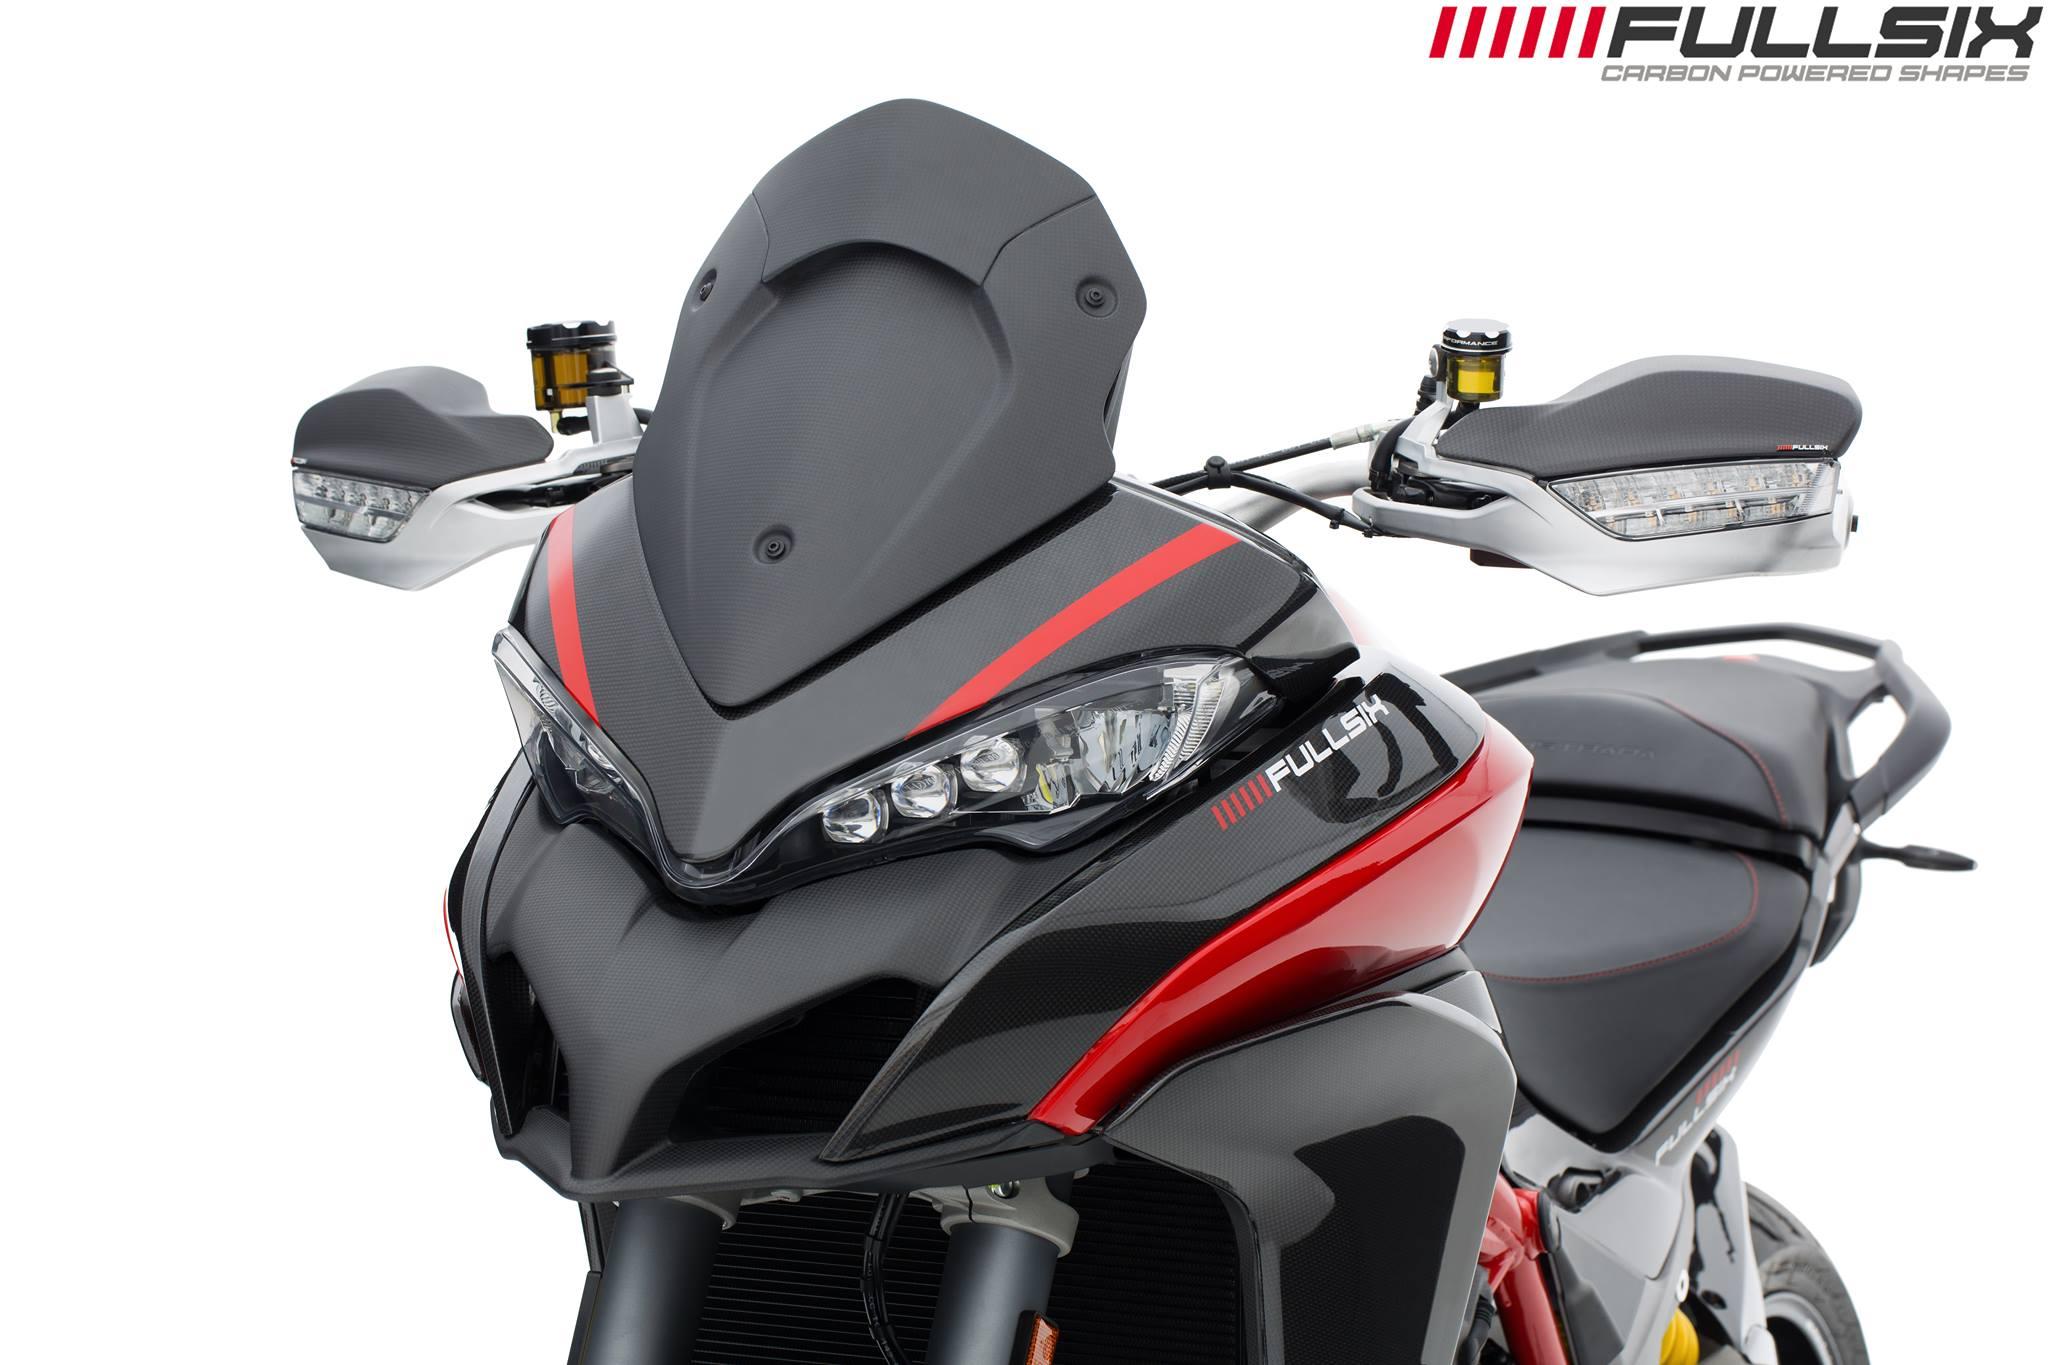 Ducati Multistrada Price